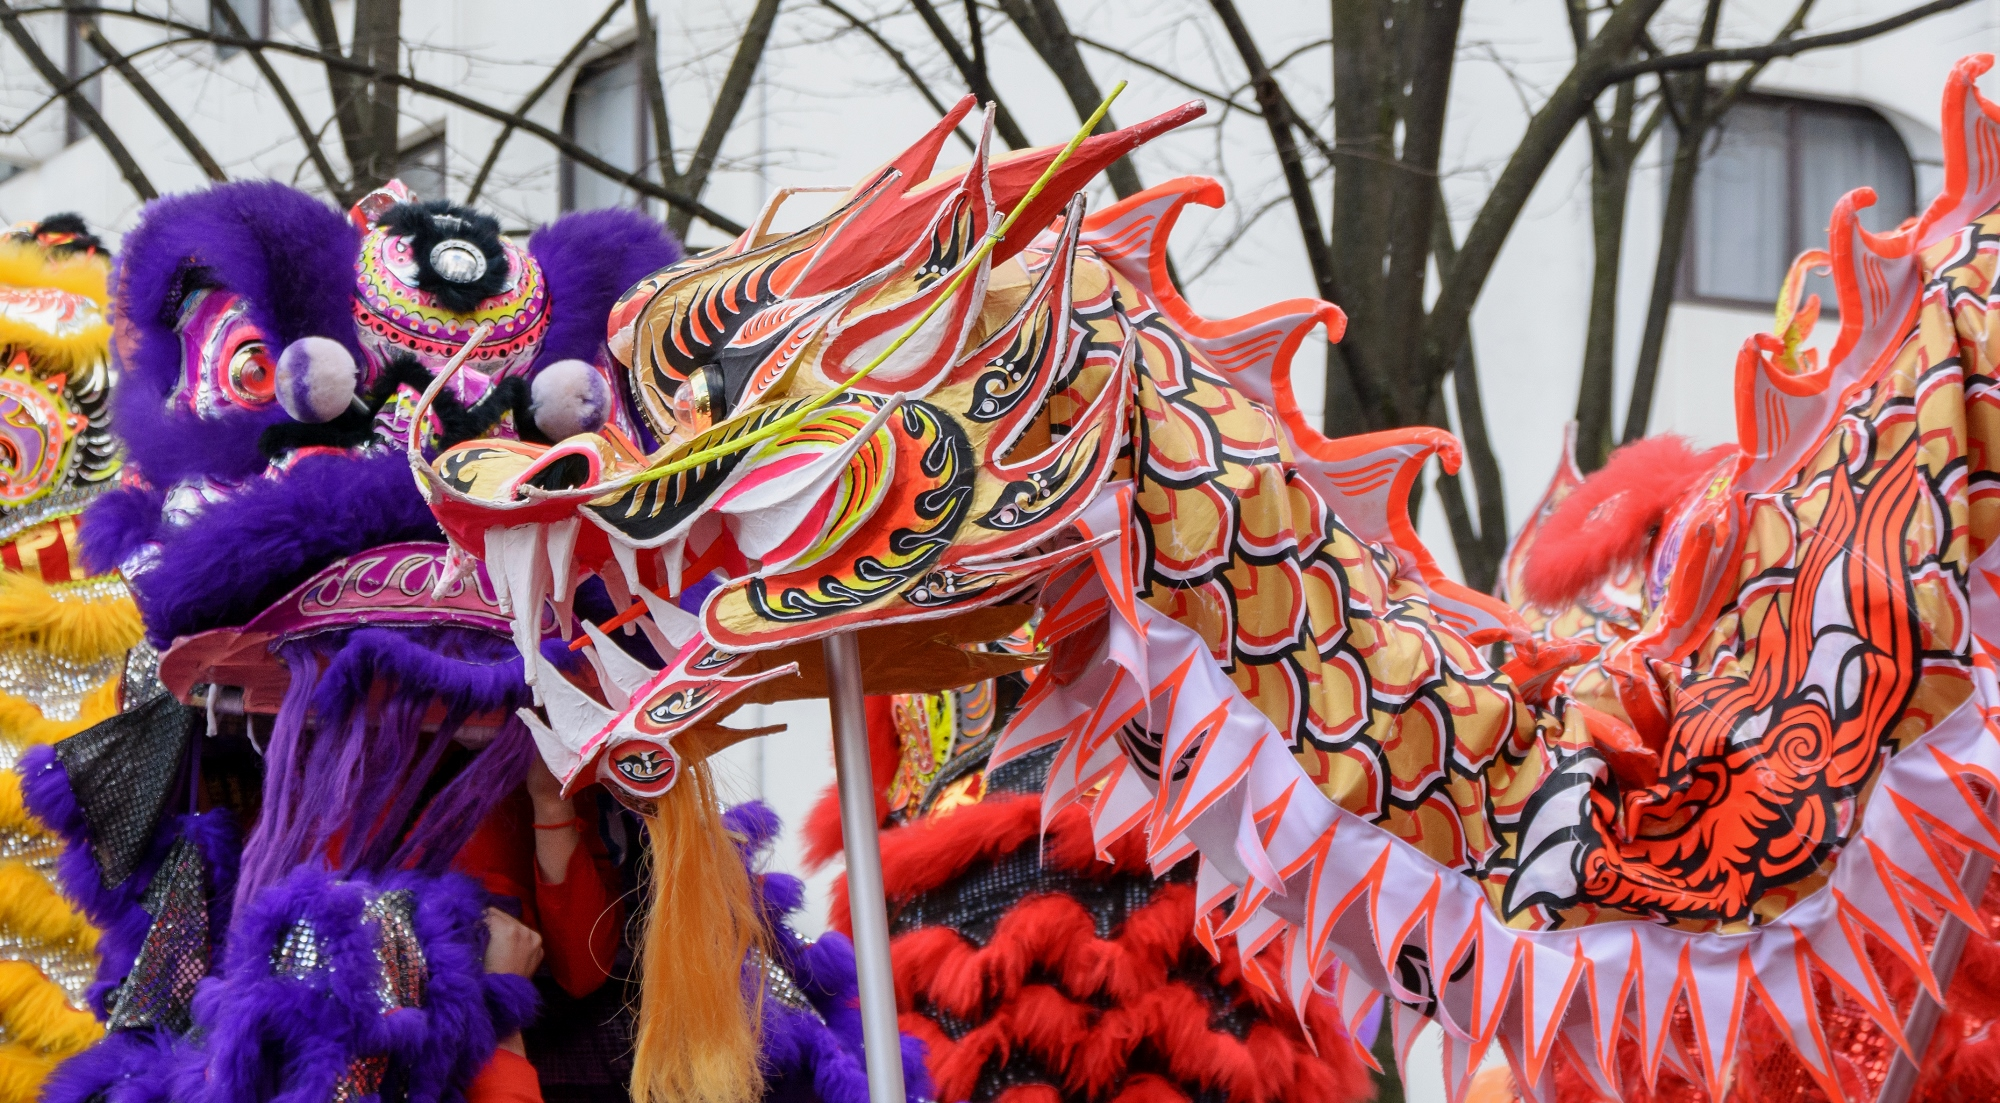 Nouvel an chinois 2015 - Paris 13e